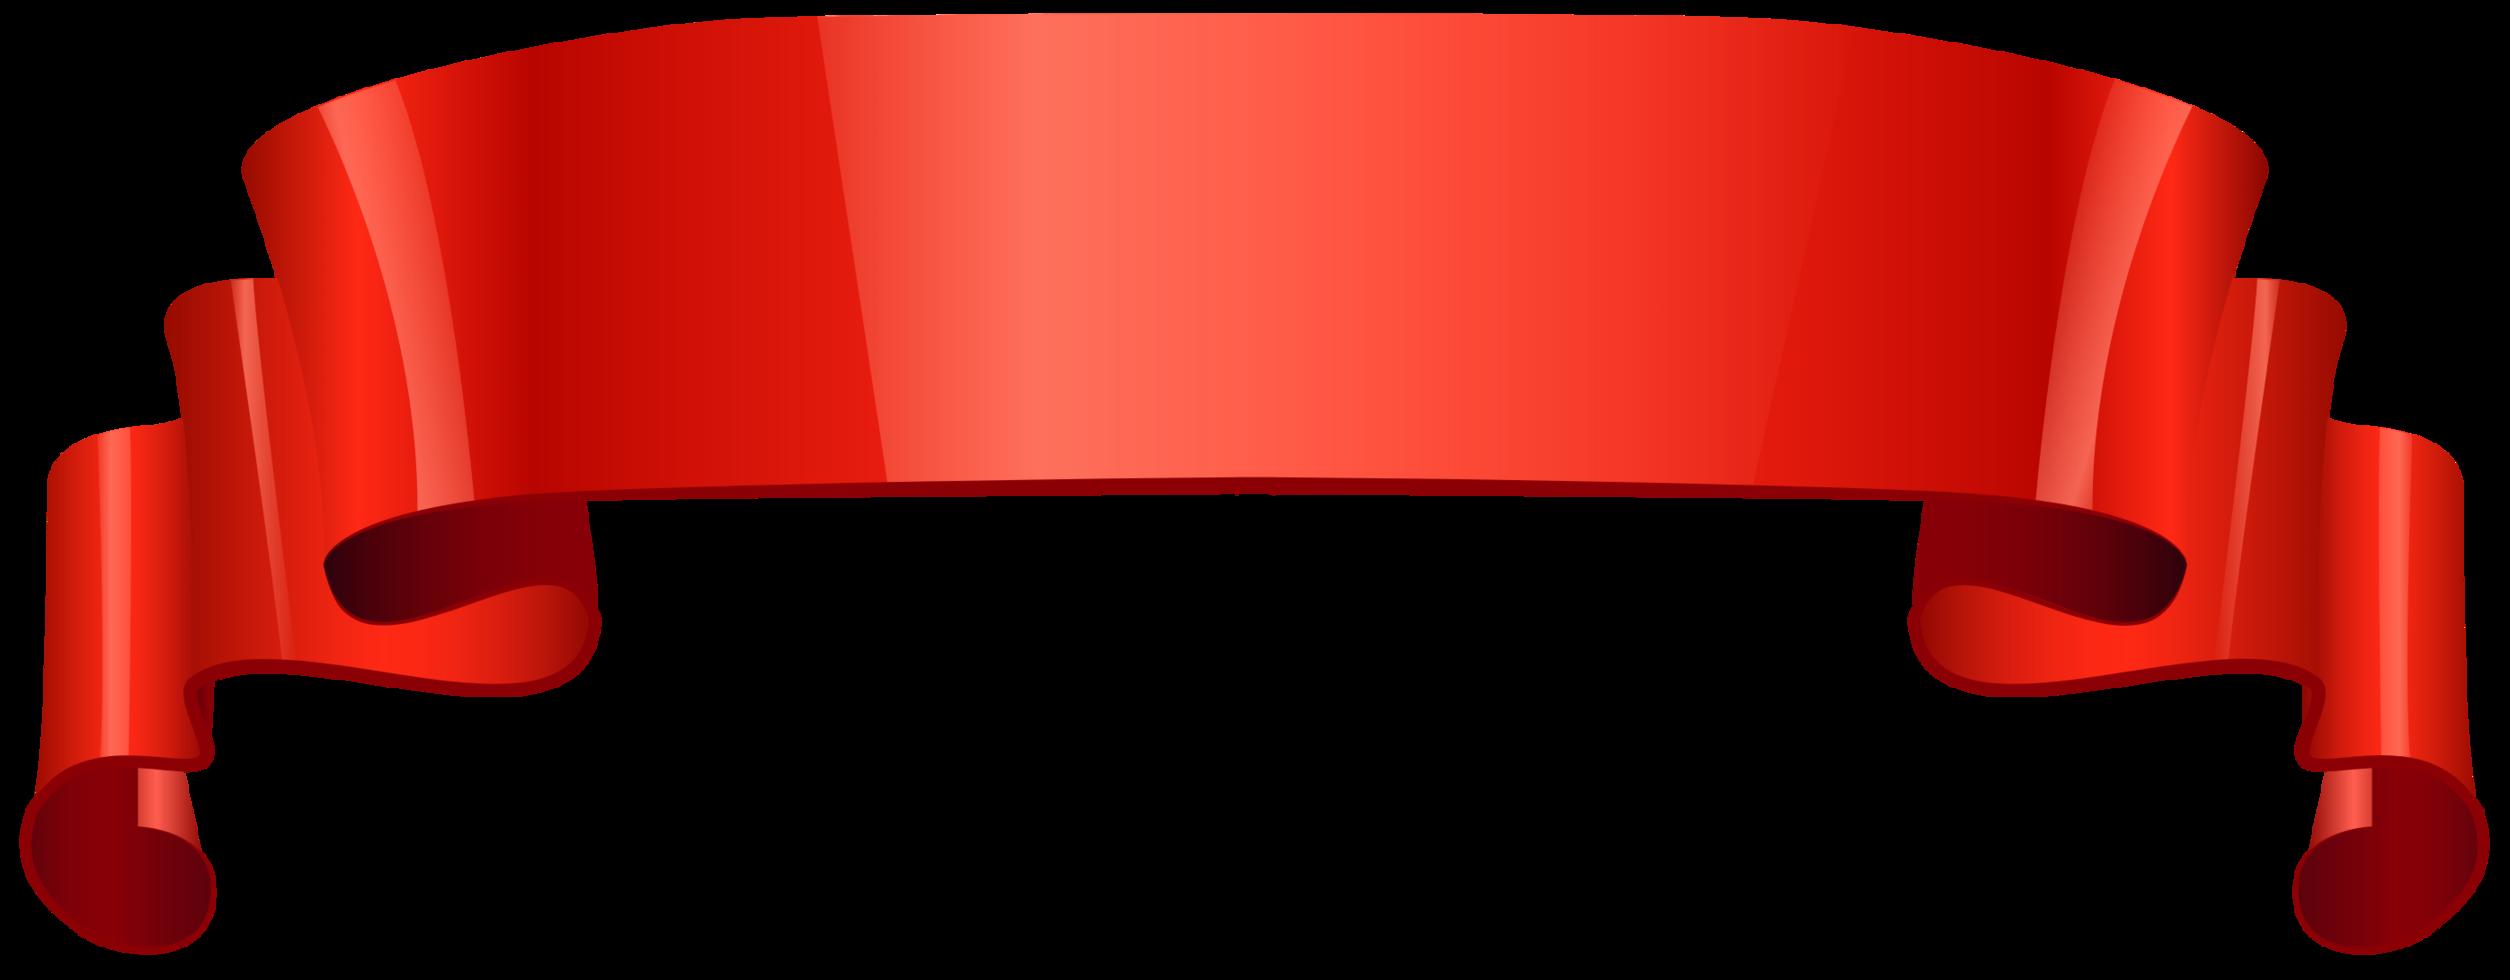 ruban brillant rouge png